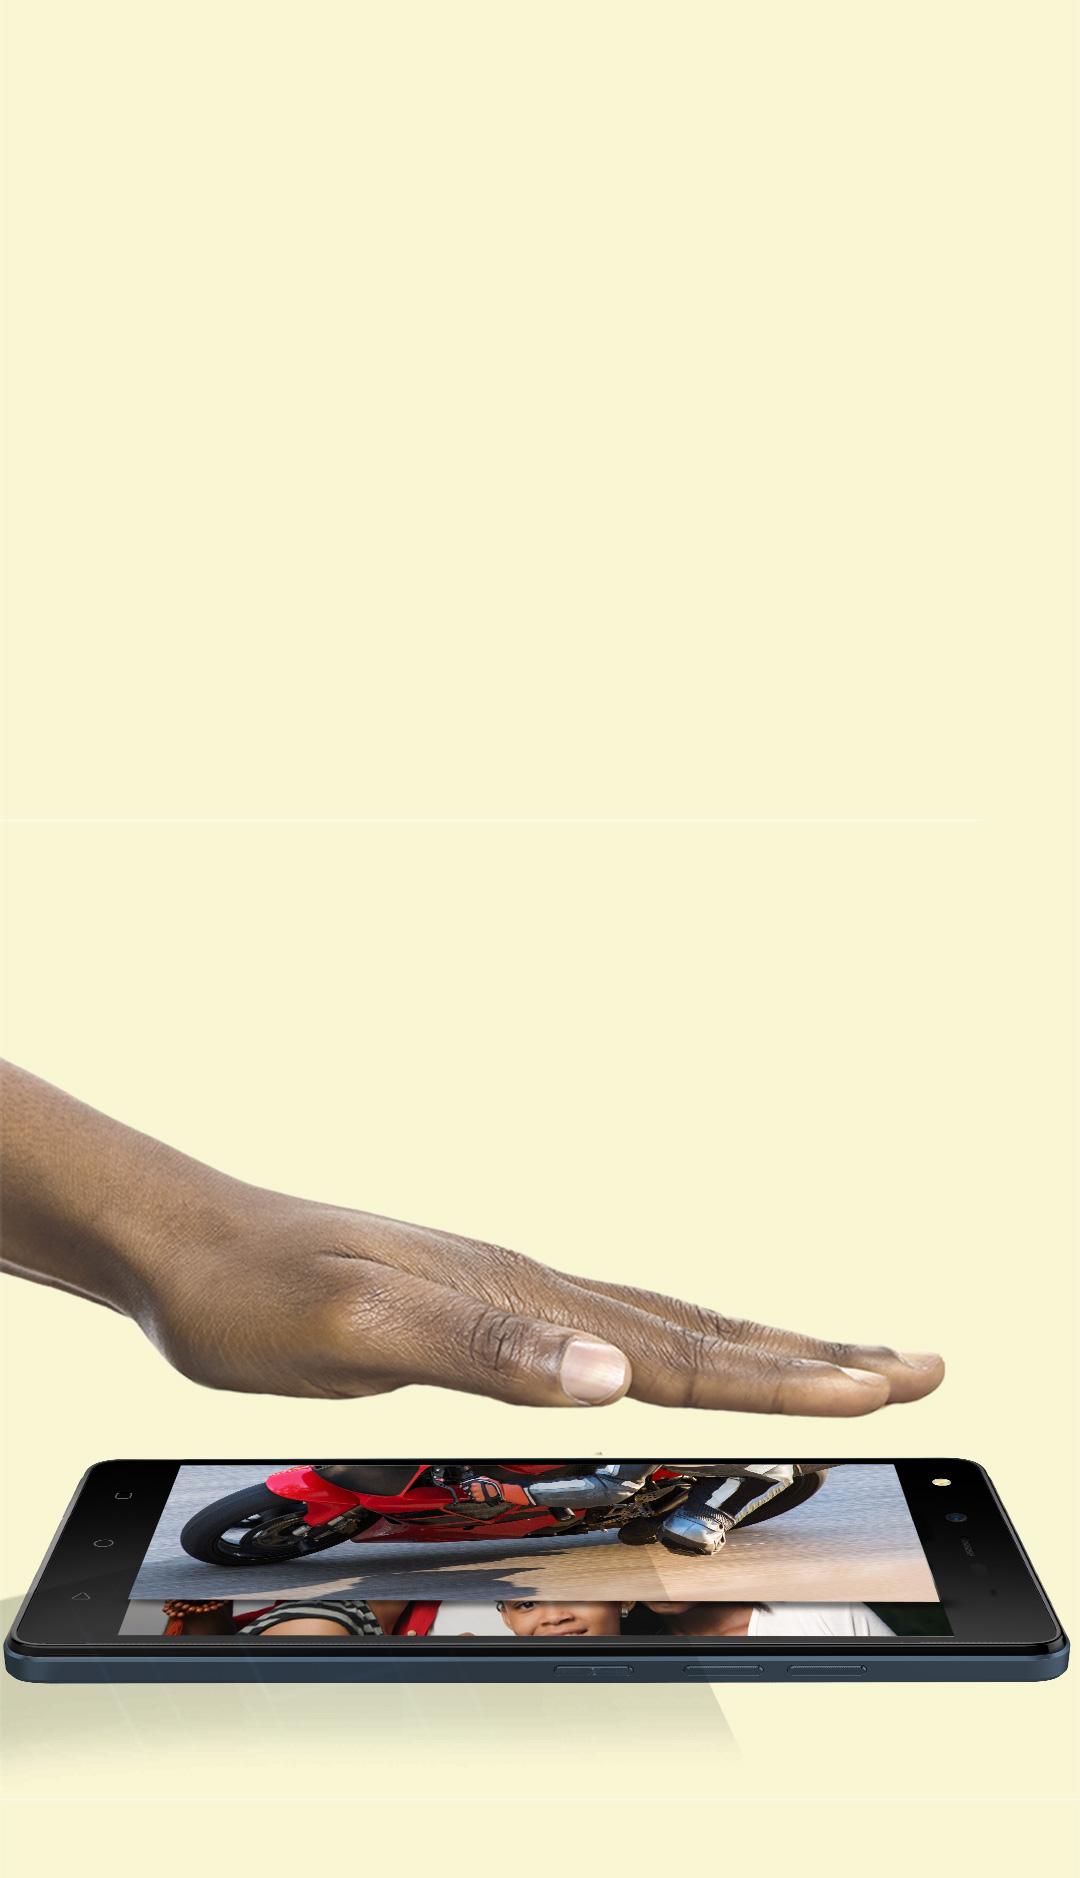 TECNO W3LTE, Air Gestures, Smart Gesture Control